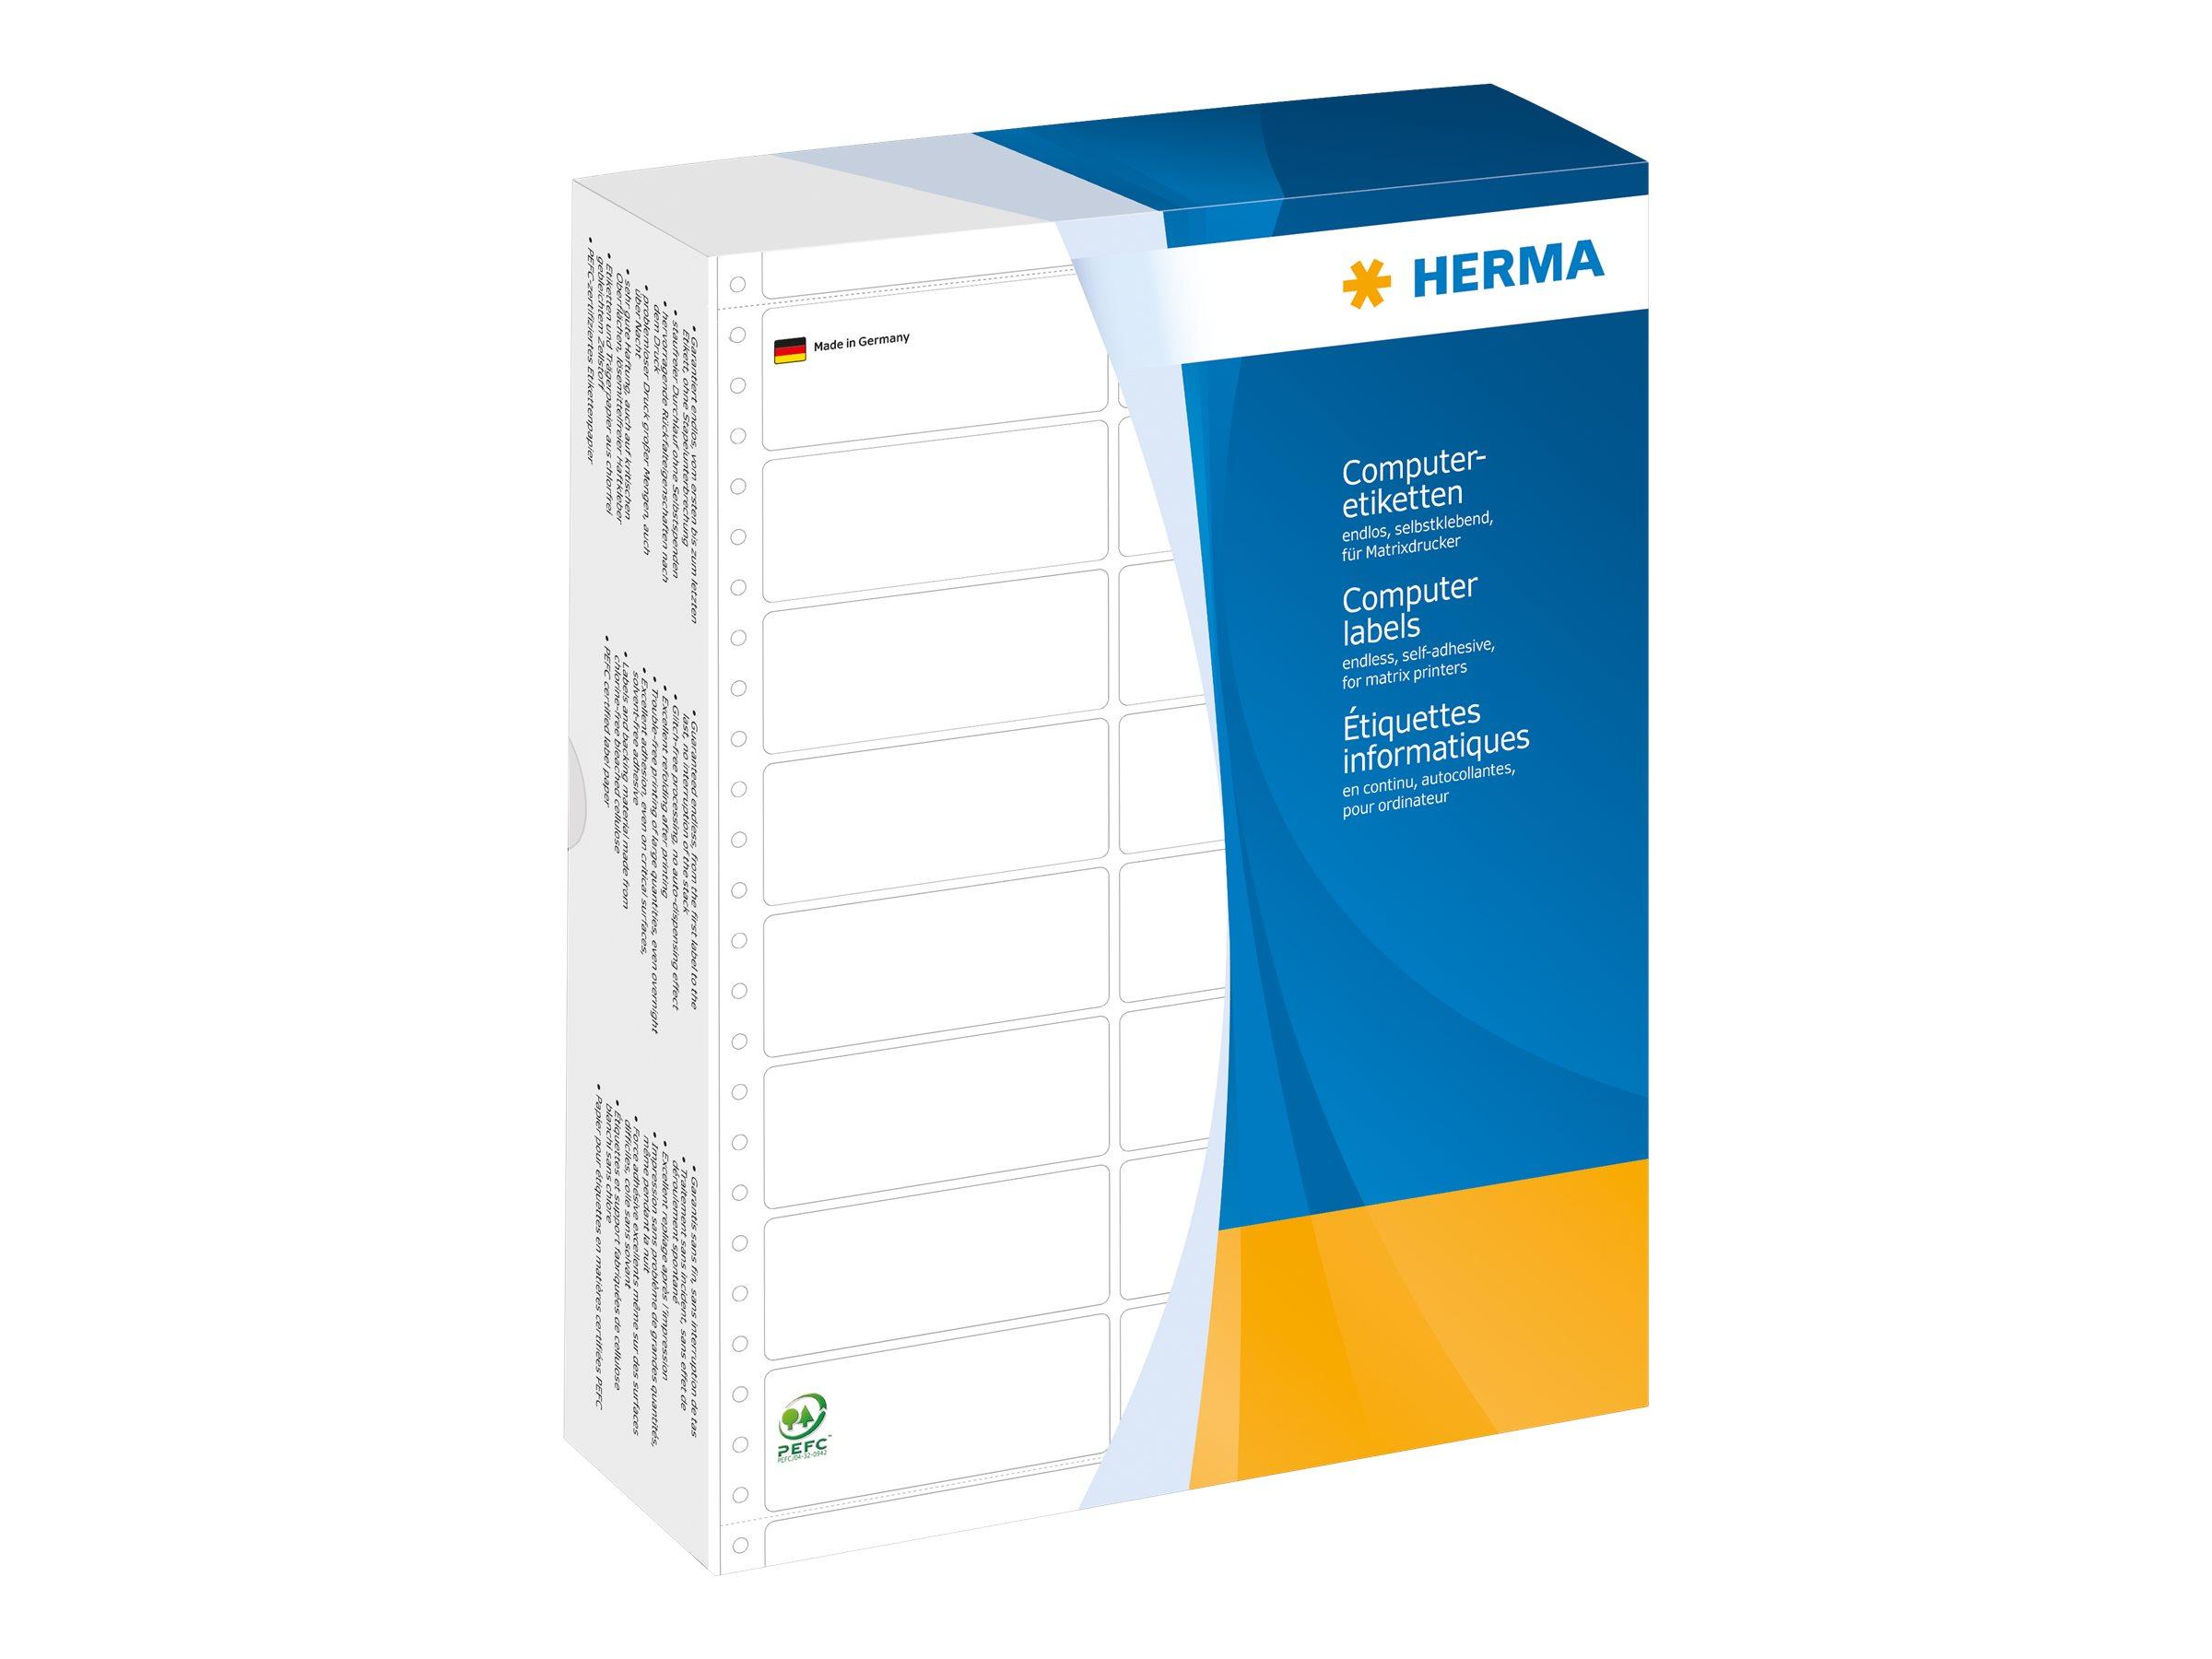 HERMA Computer labels - Papier - matt - permanent selbstklebend - perforiert - weiß - 68.58 x 35.7 mm 12000 Etikett(en) (3 Bogen x 4000)